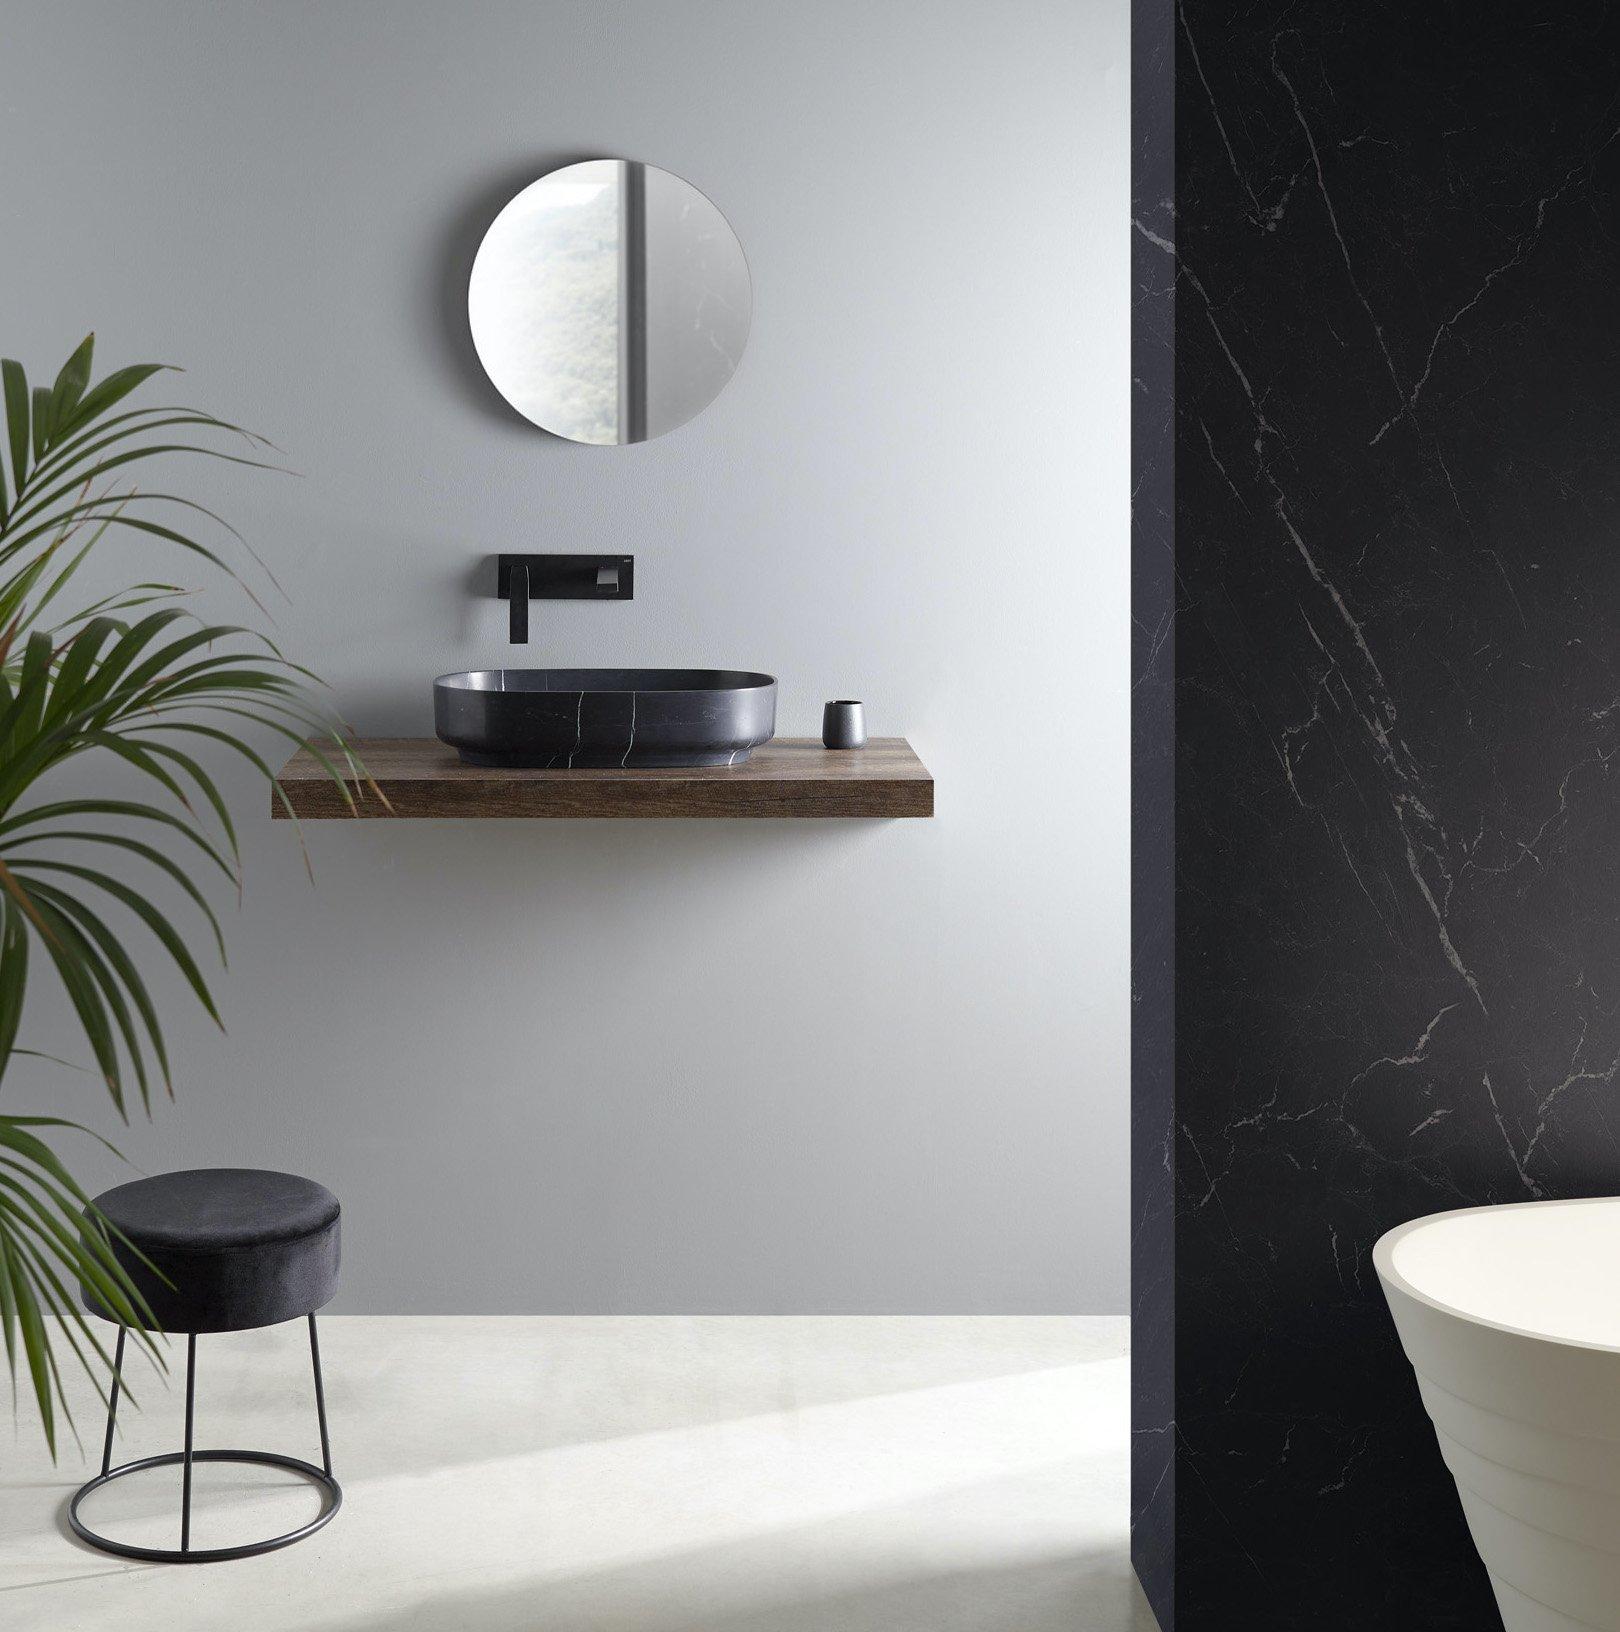 The secret to great hotel bathroom design